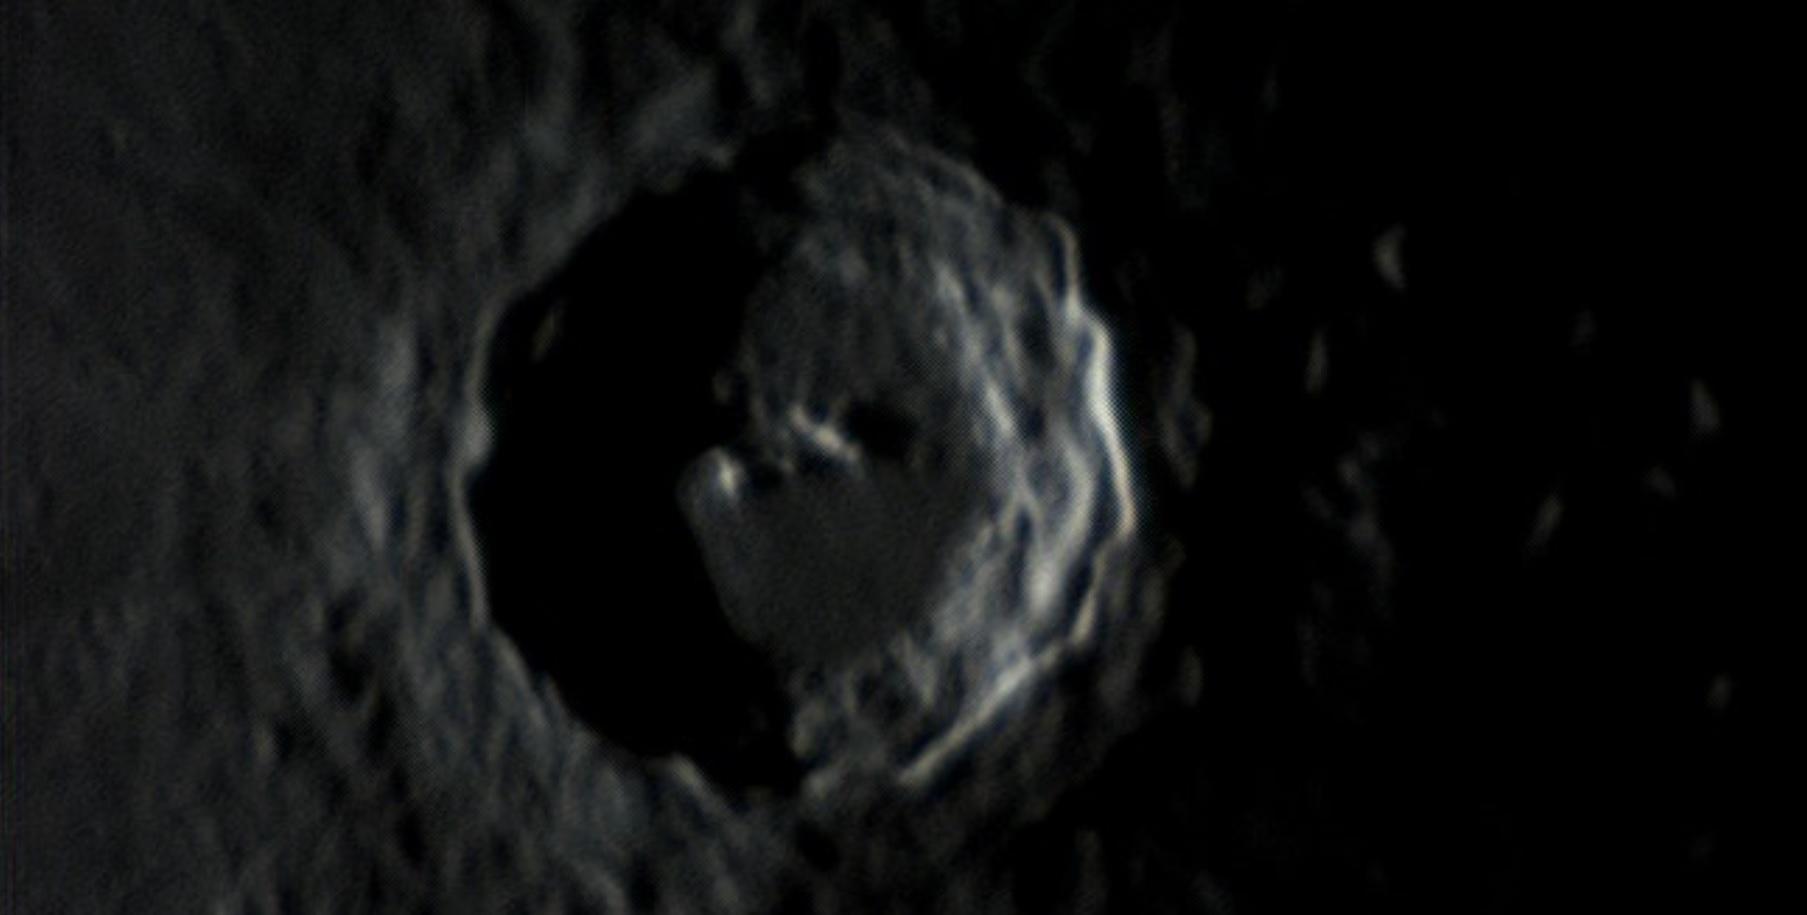 Copernicus_9-25tum_f20_20120302201607258_lapl5_ap240_30procent_b. Foto Jörgen Danielsson